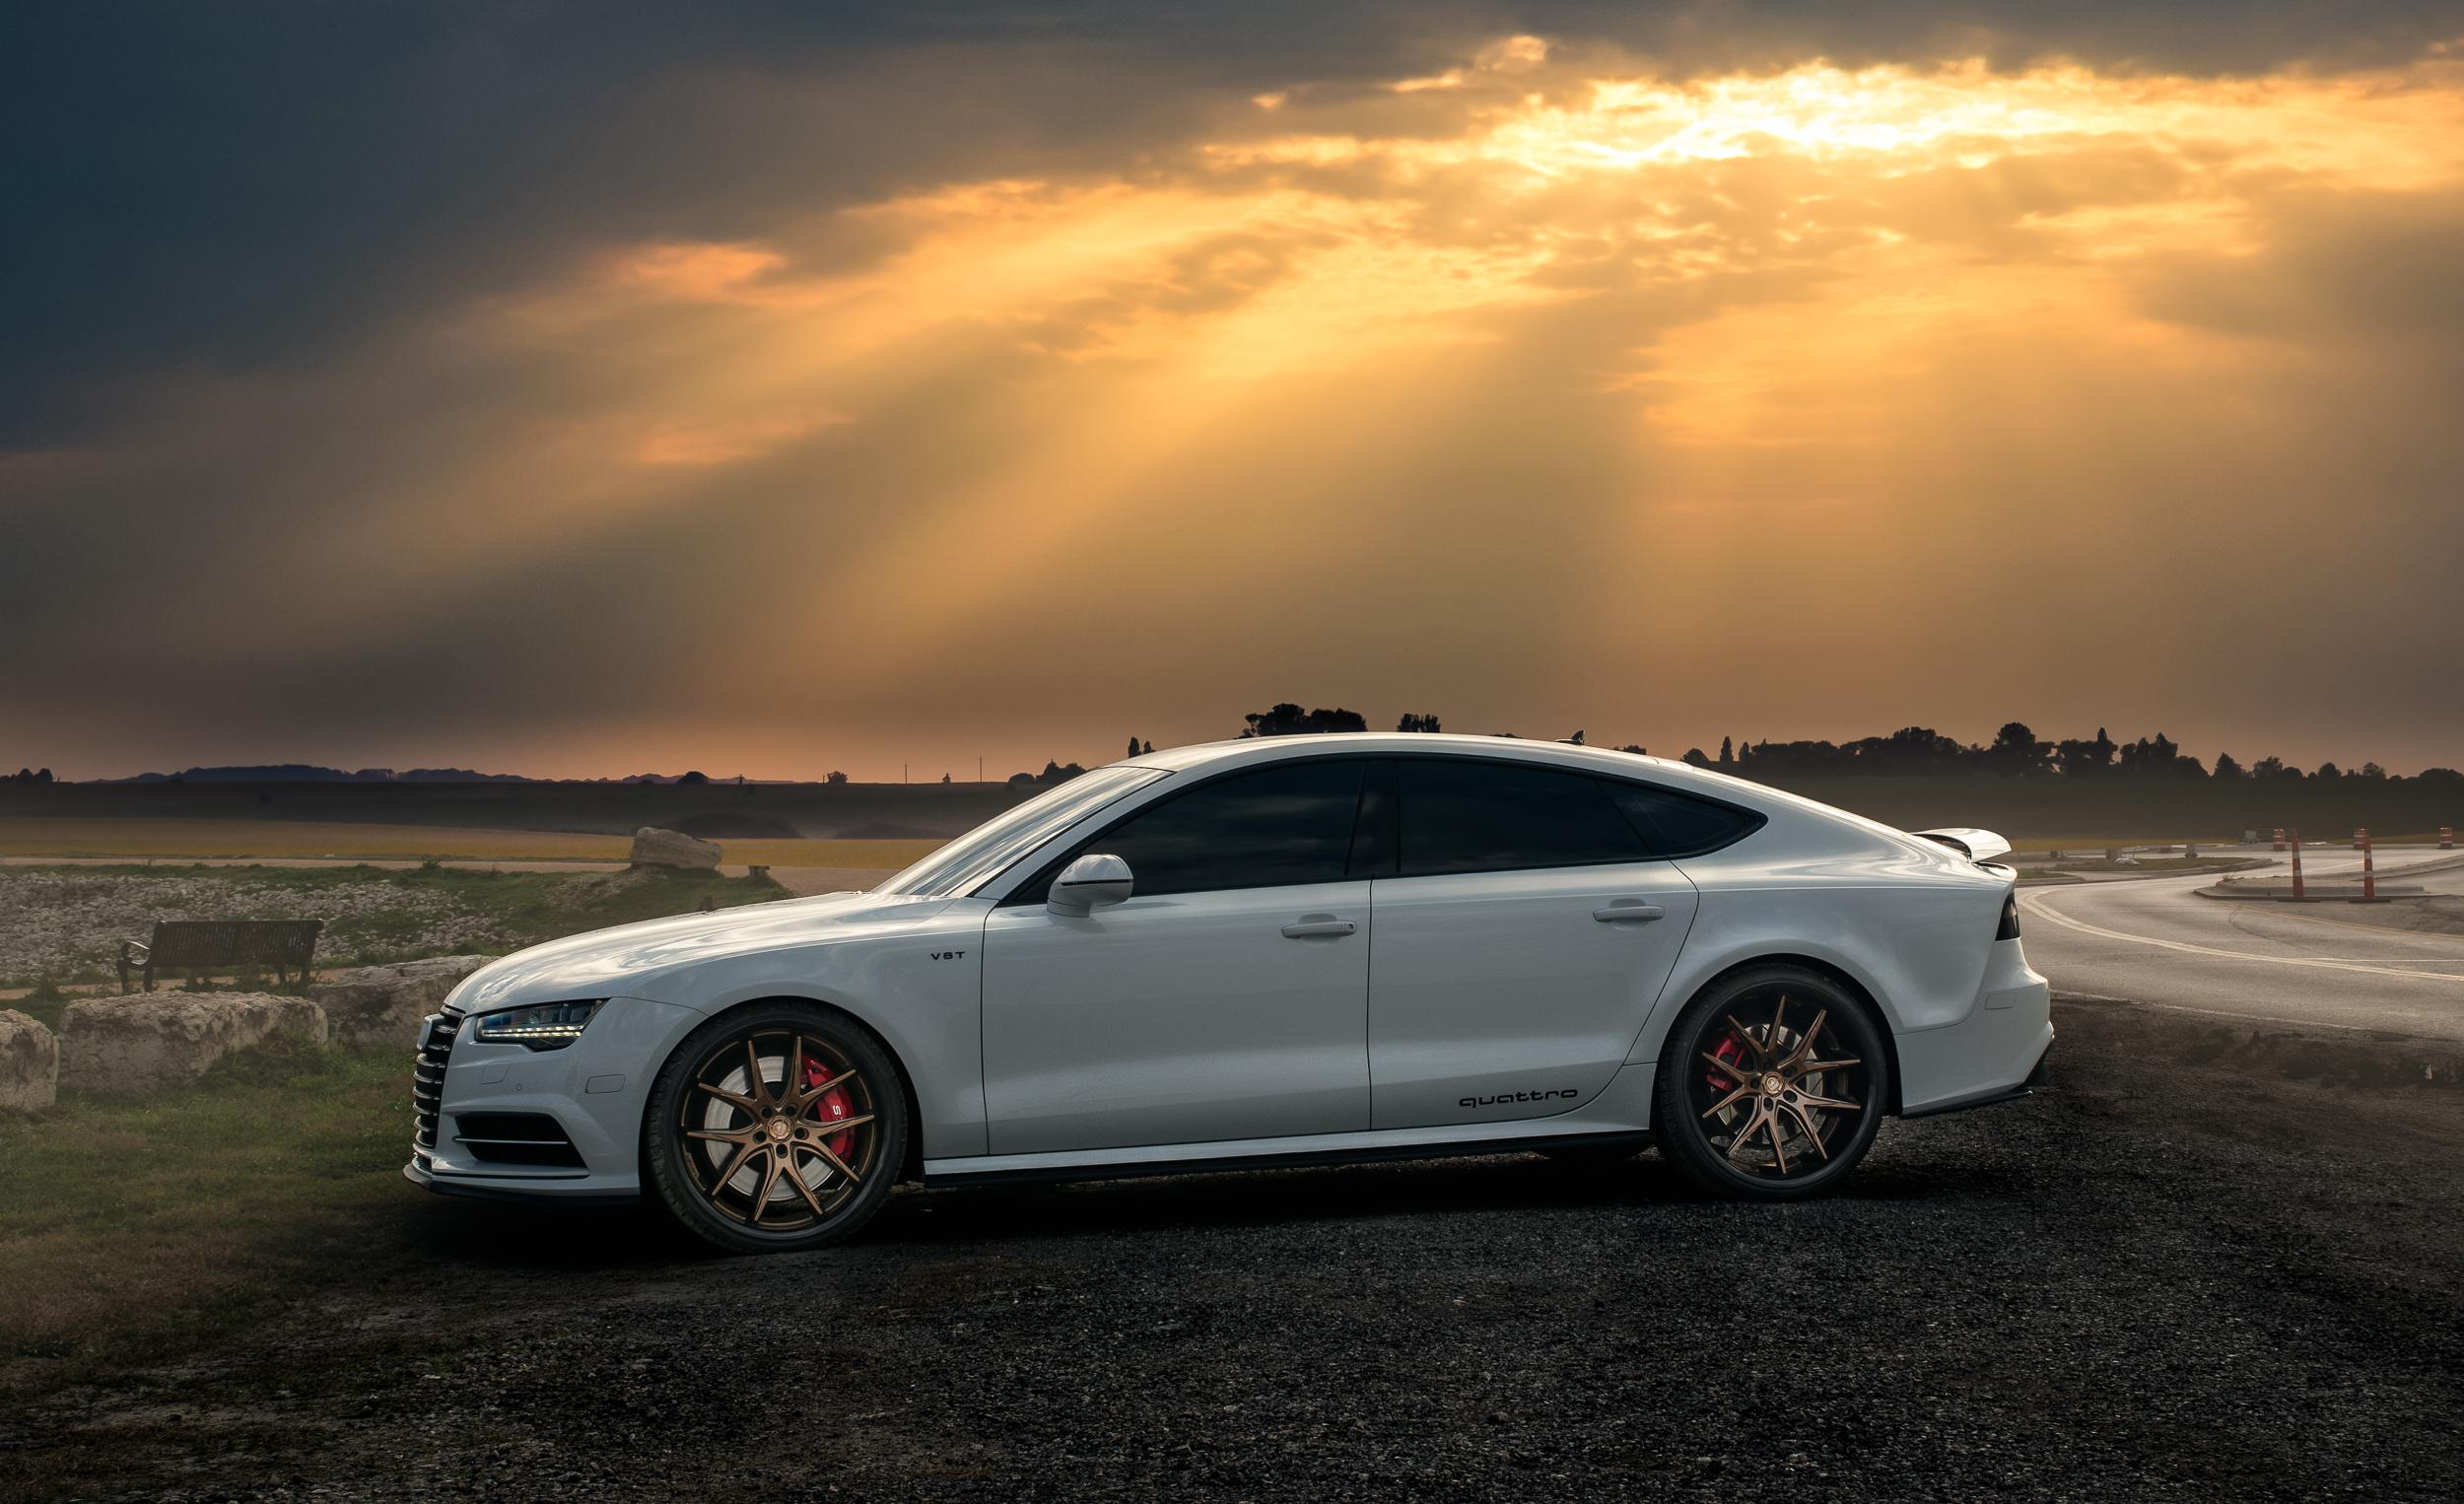 Audi RS7 Lexani Wheels Automotive Photographer Albert Polanco.jpg